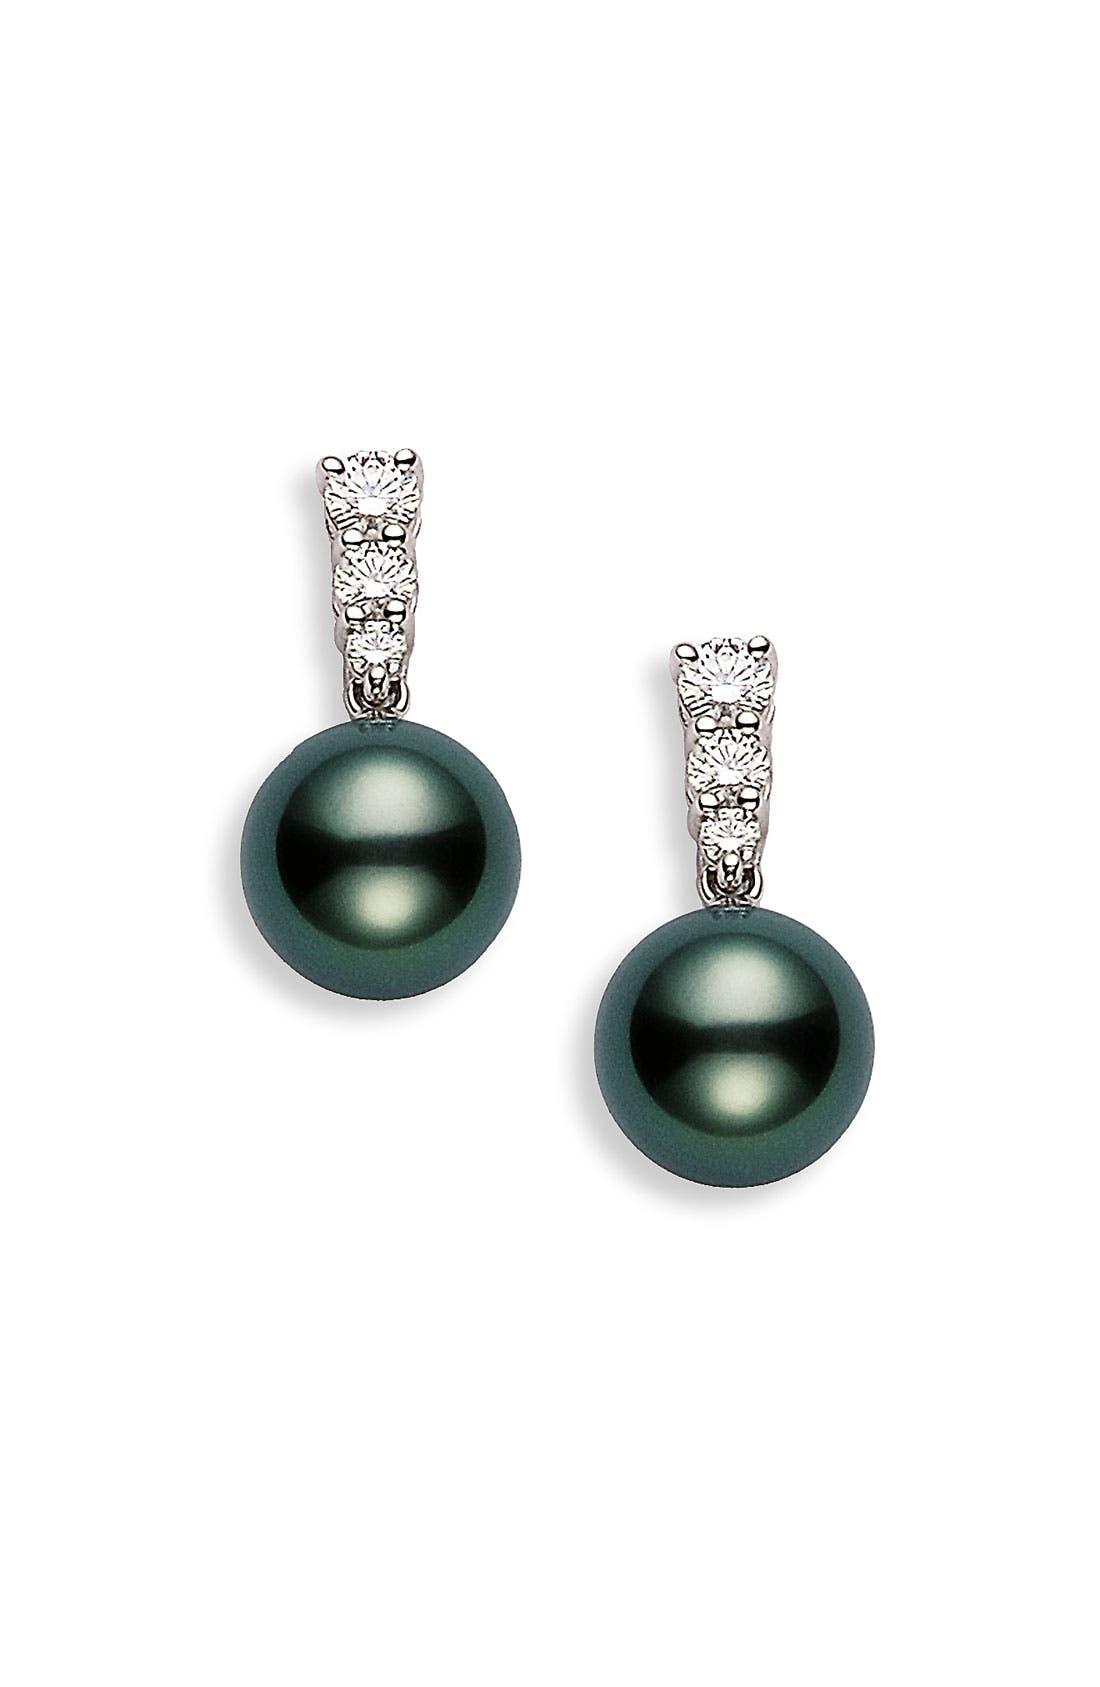 Alternate Image 1 Selected - Mikimoto 'Morning Dew' Black South Sea Cultured Pearl & Diamond Earrings